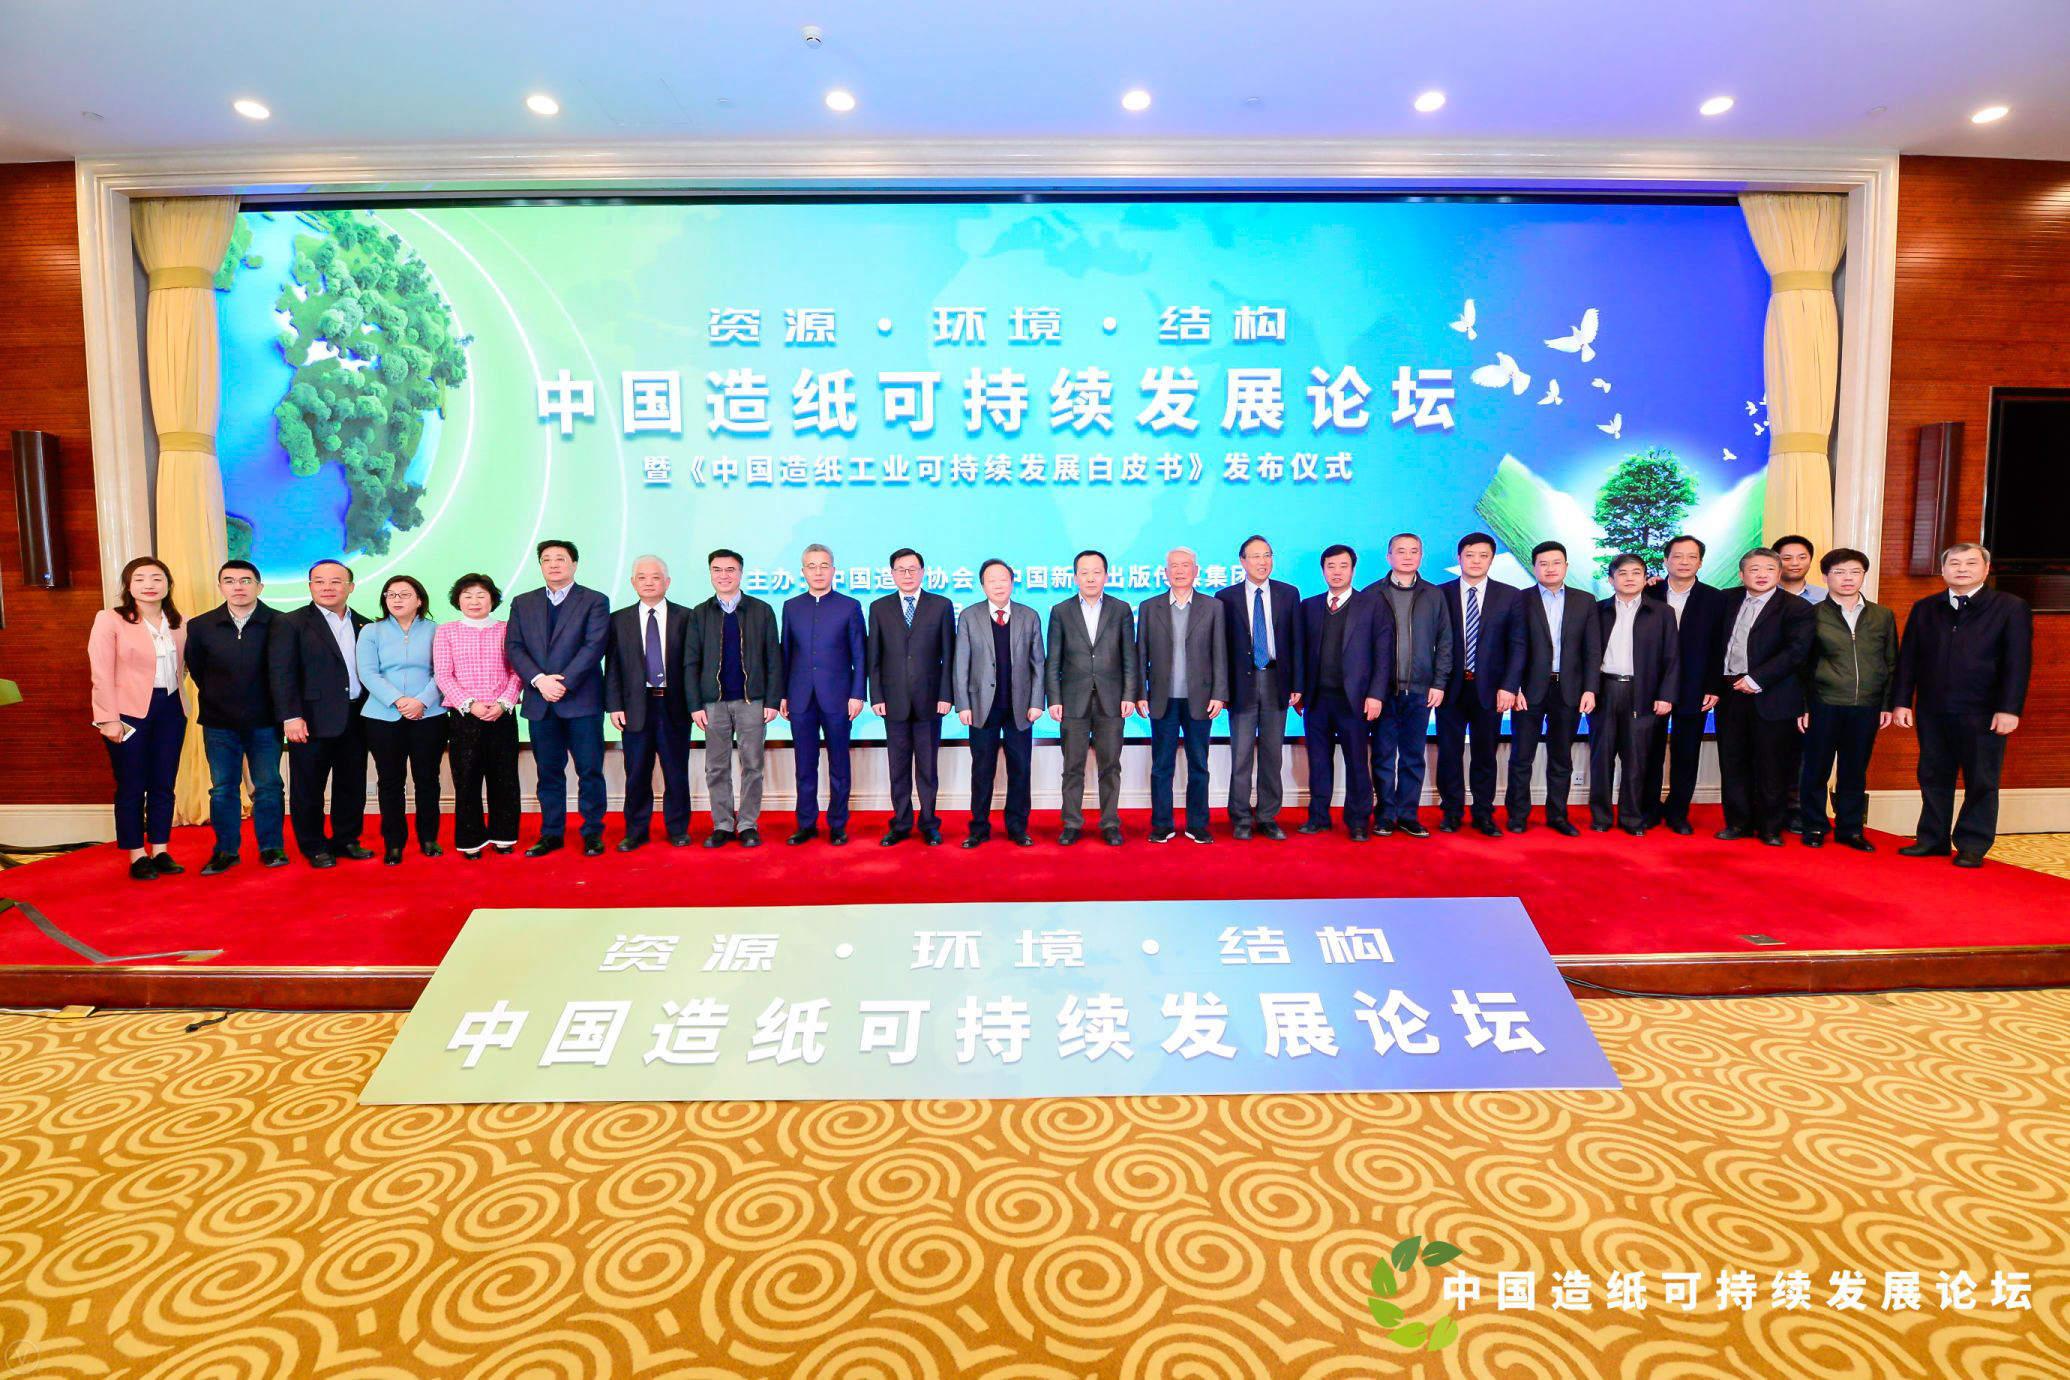 manbetx万博直播可持续发展论坛暨《manbetx万博直播工业可持续发展白皮书》发布仪式在京举行